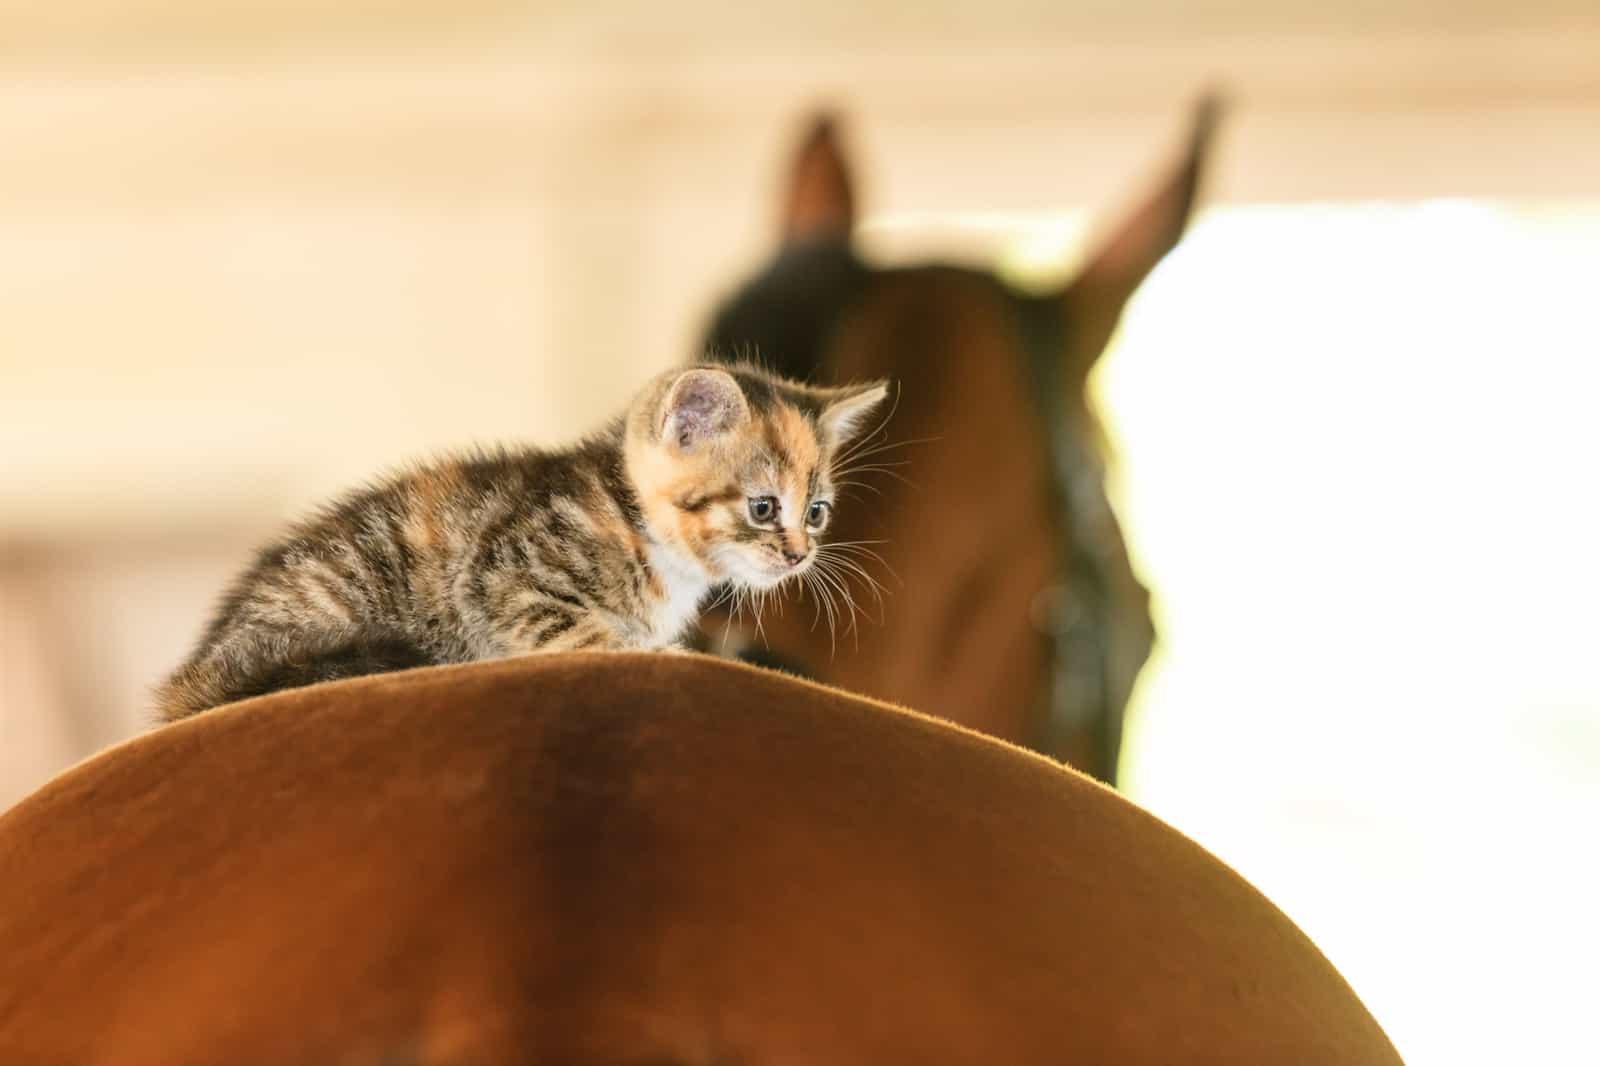 Little cute kitten kitty cat pet animal on horse horseback.